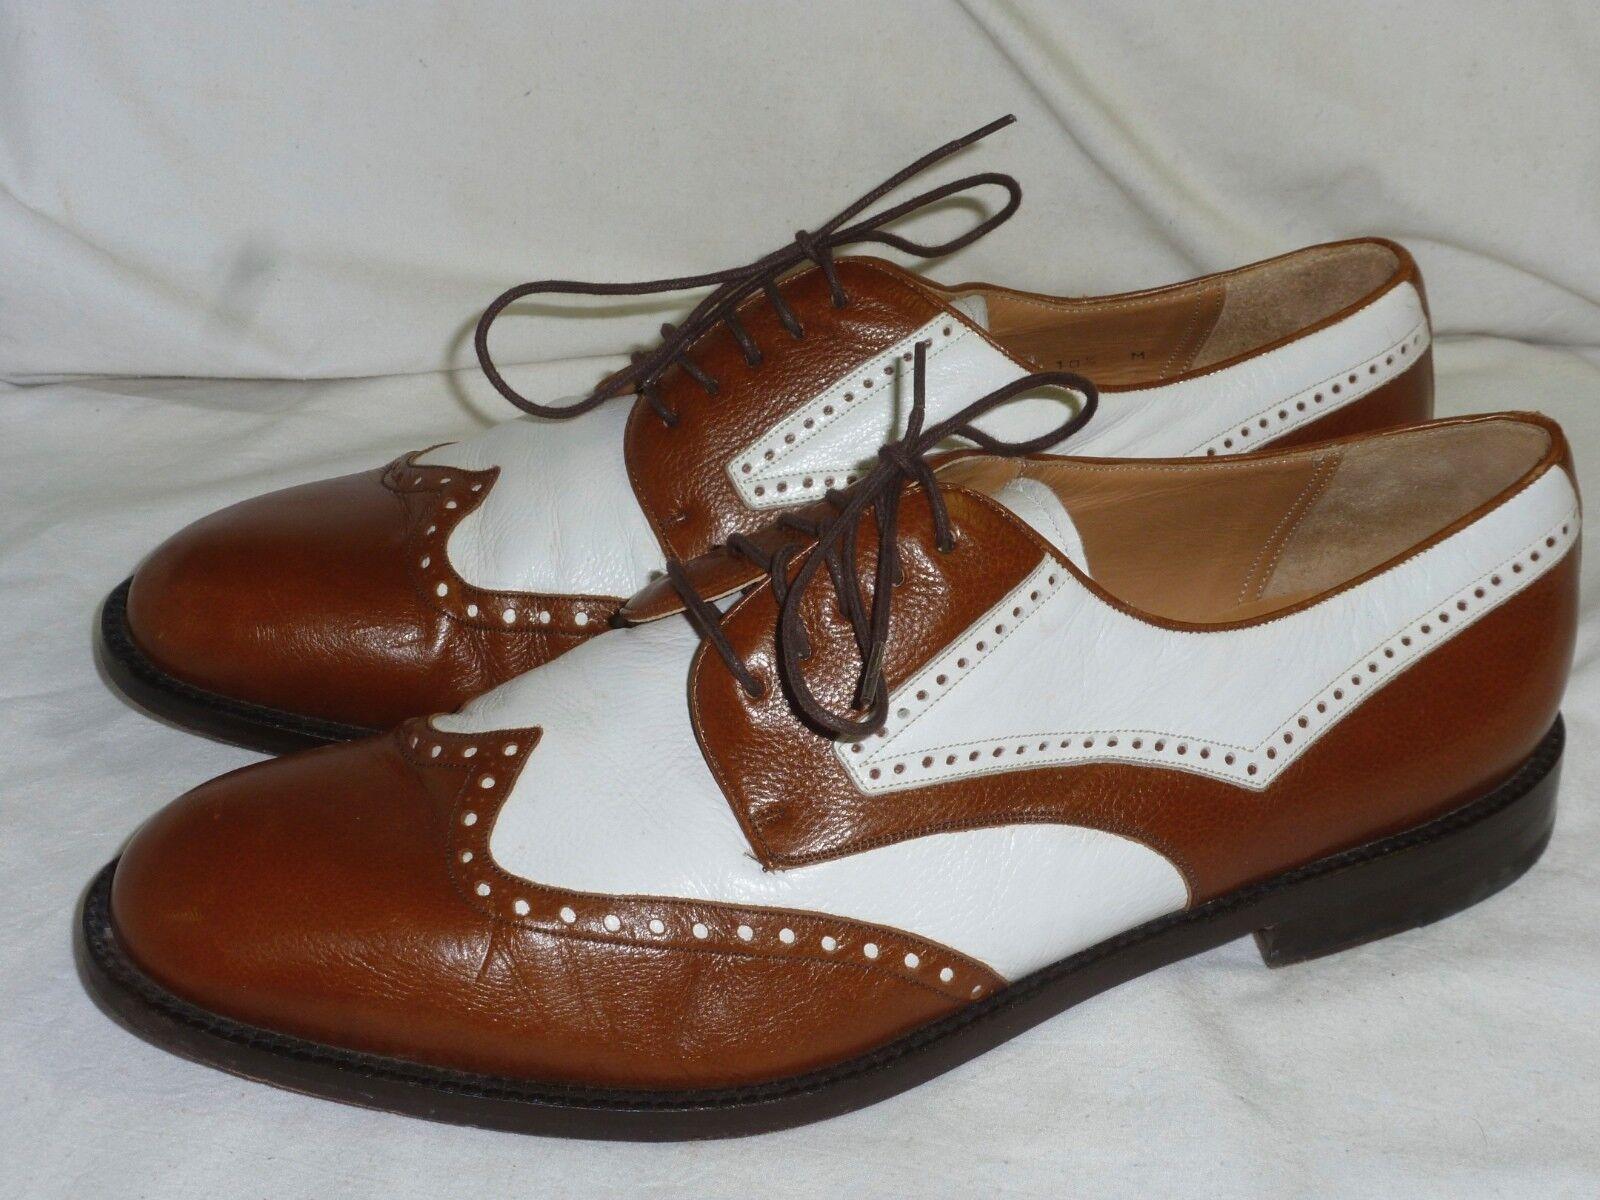 Mezlan Two-Tone bianca & Marronee Leather Wingtip Oxford 10.5 M Sautope classeiche da uomo